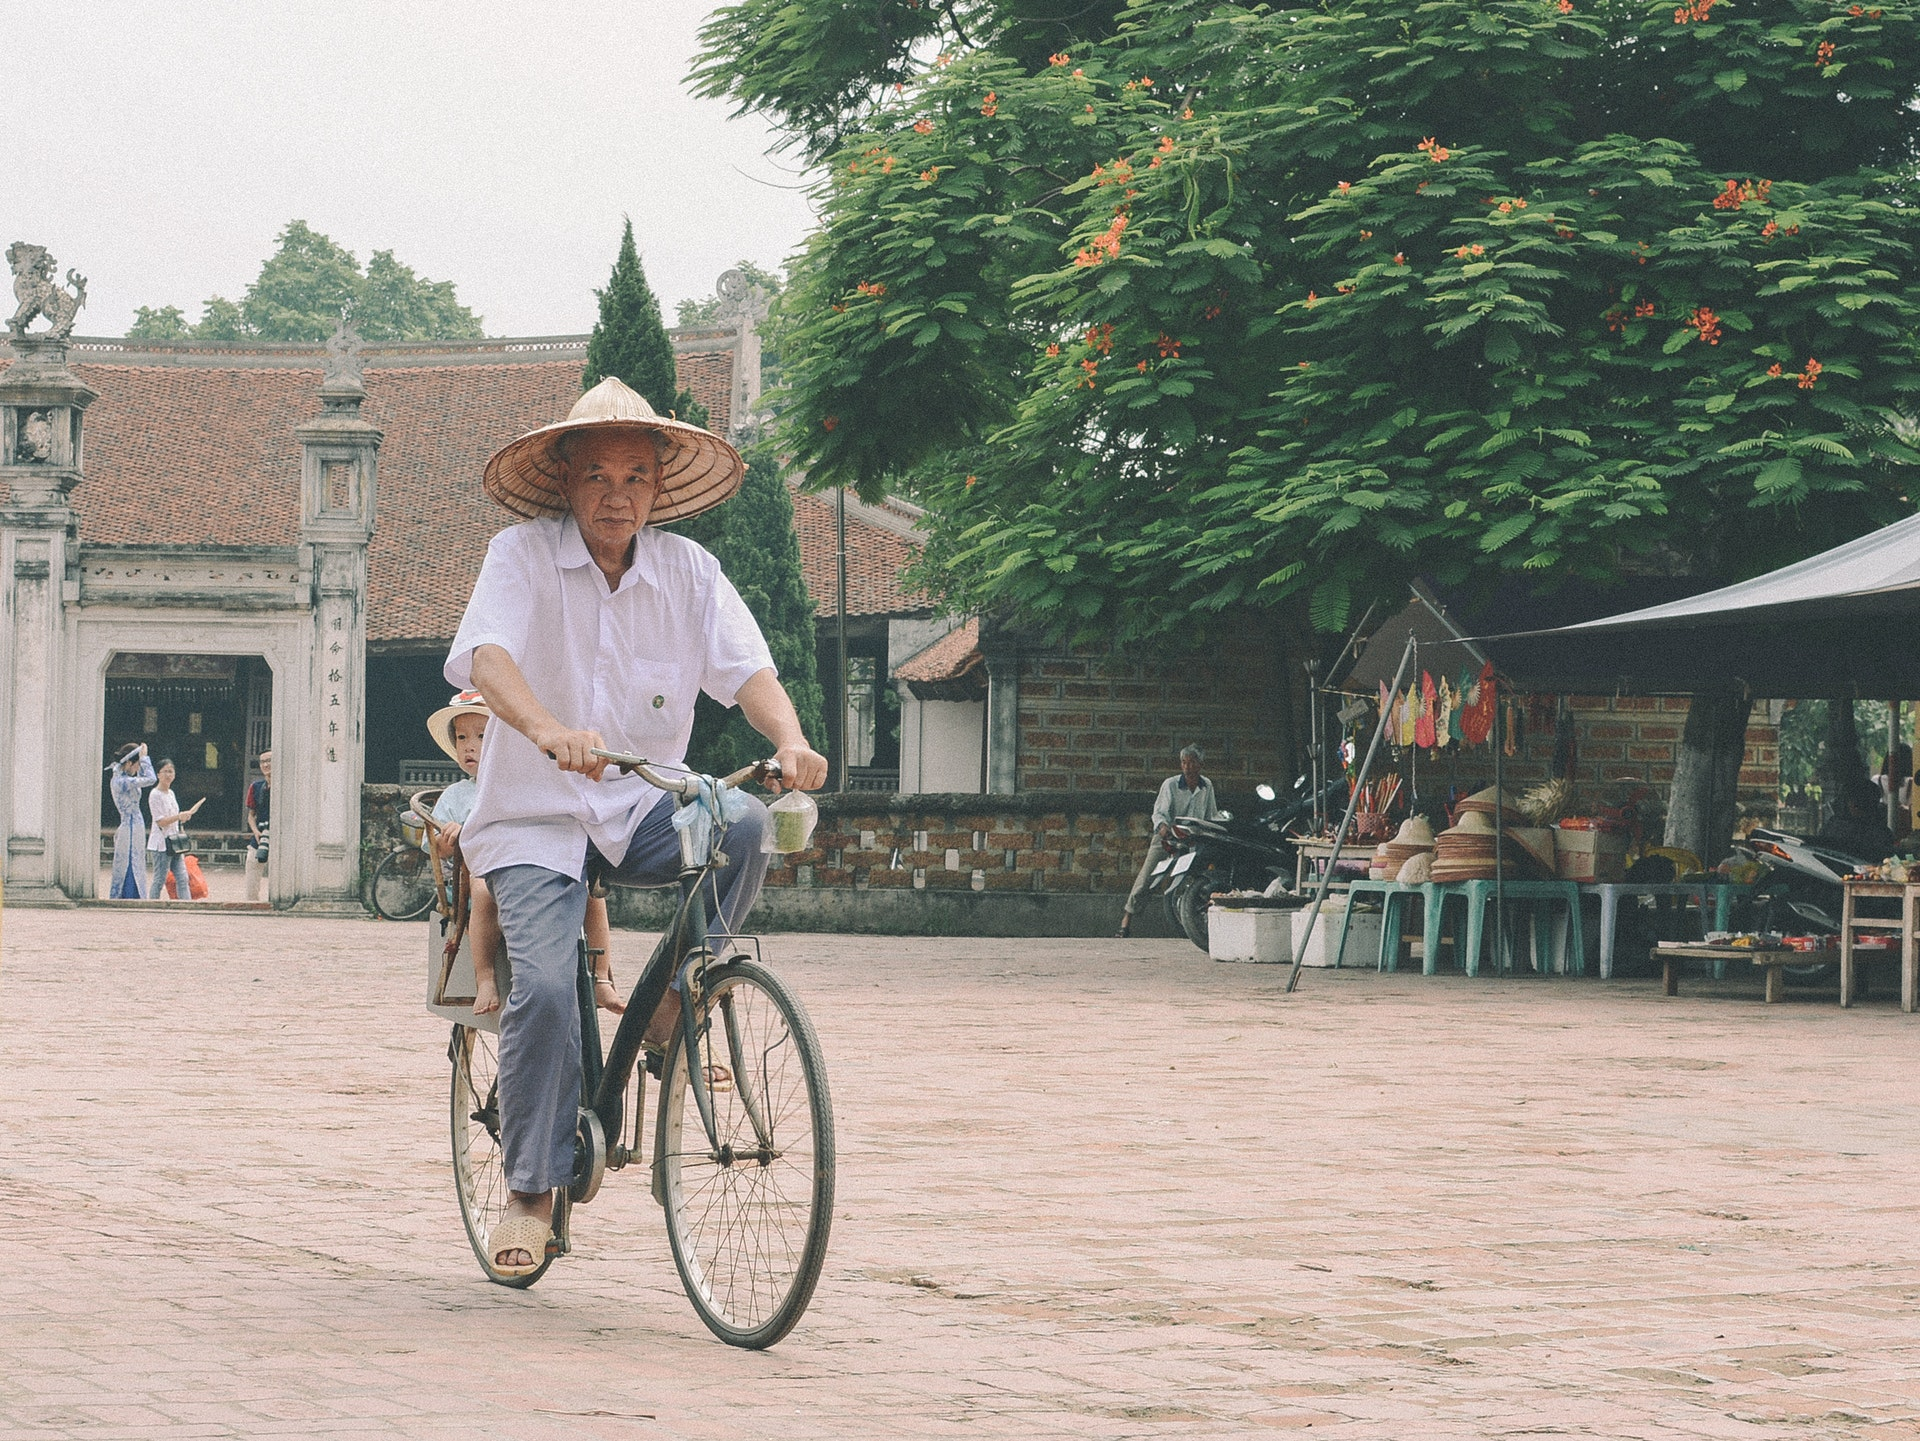 Vietnam-Vietnamese-Man-Bicycle-Bike